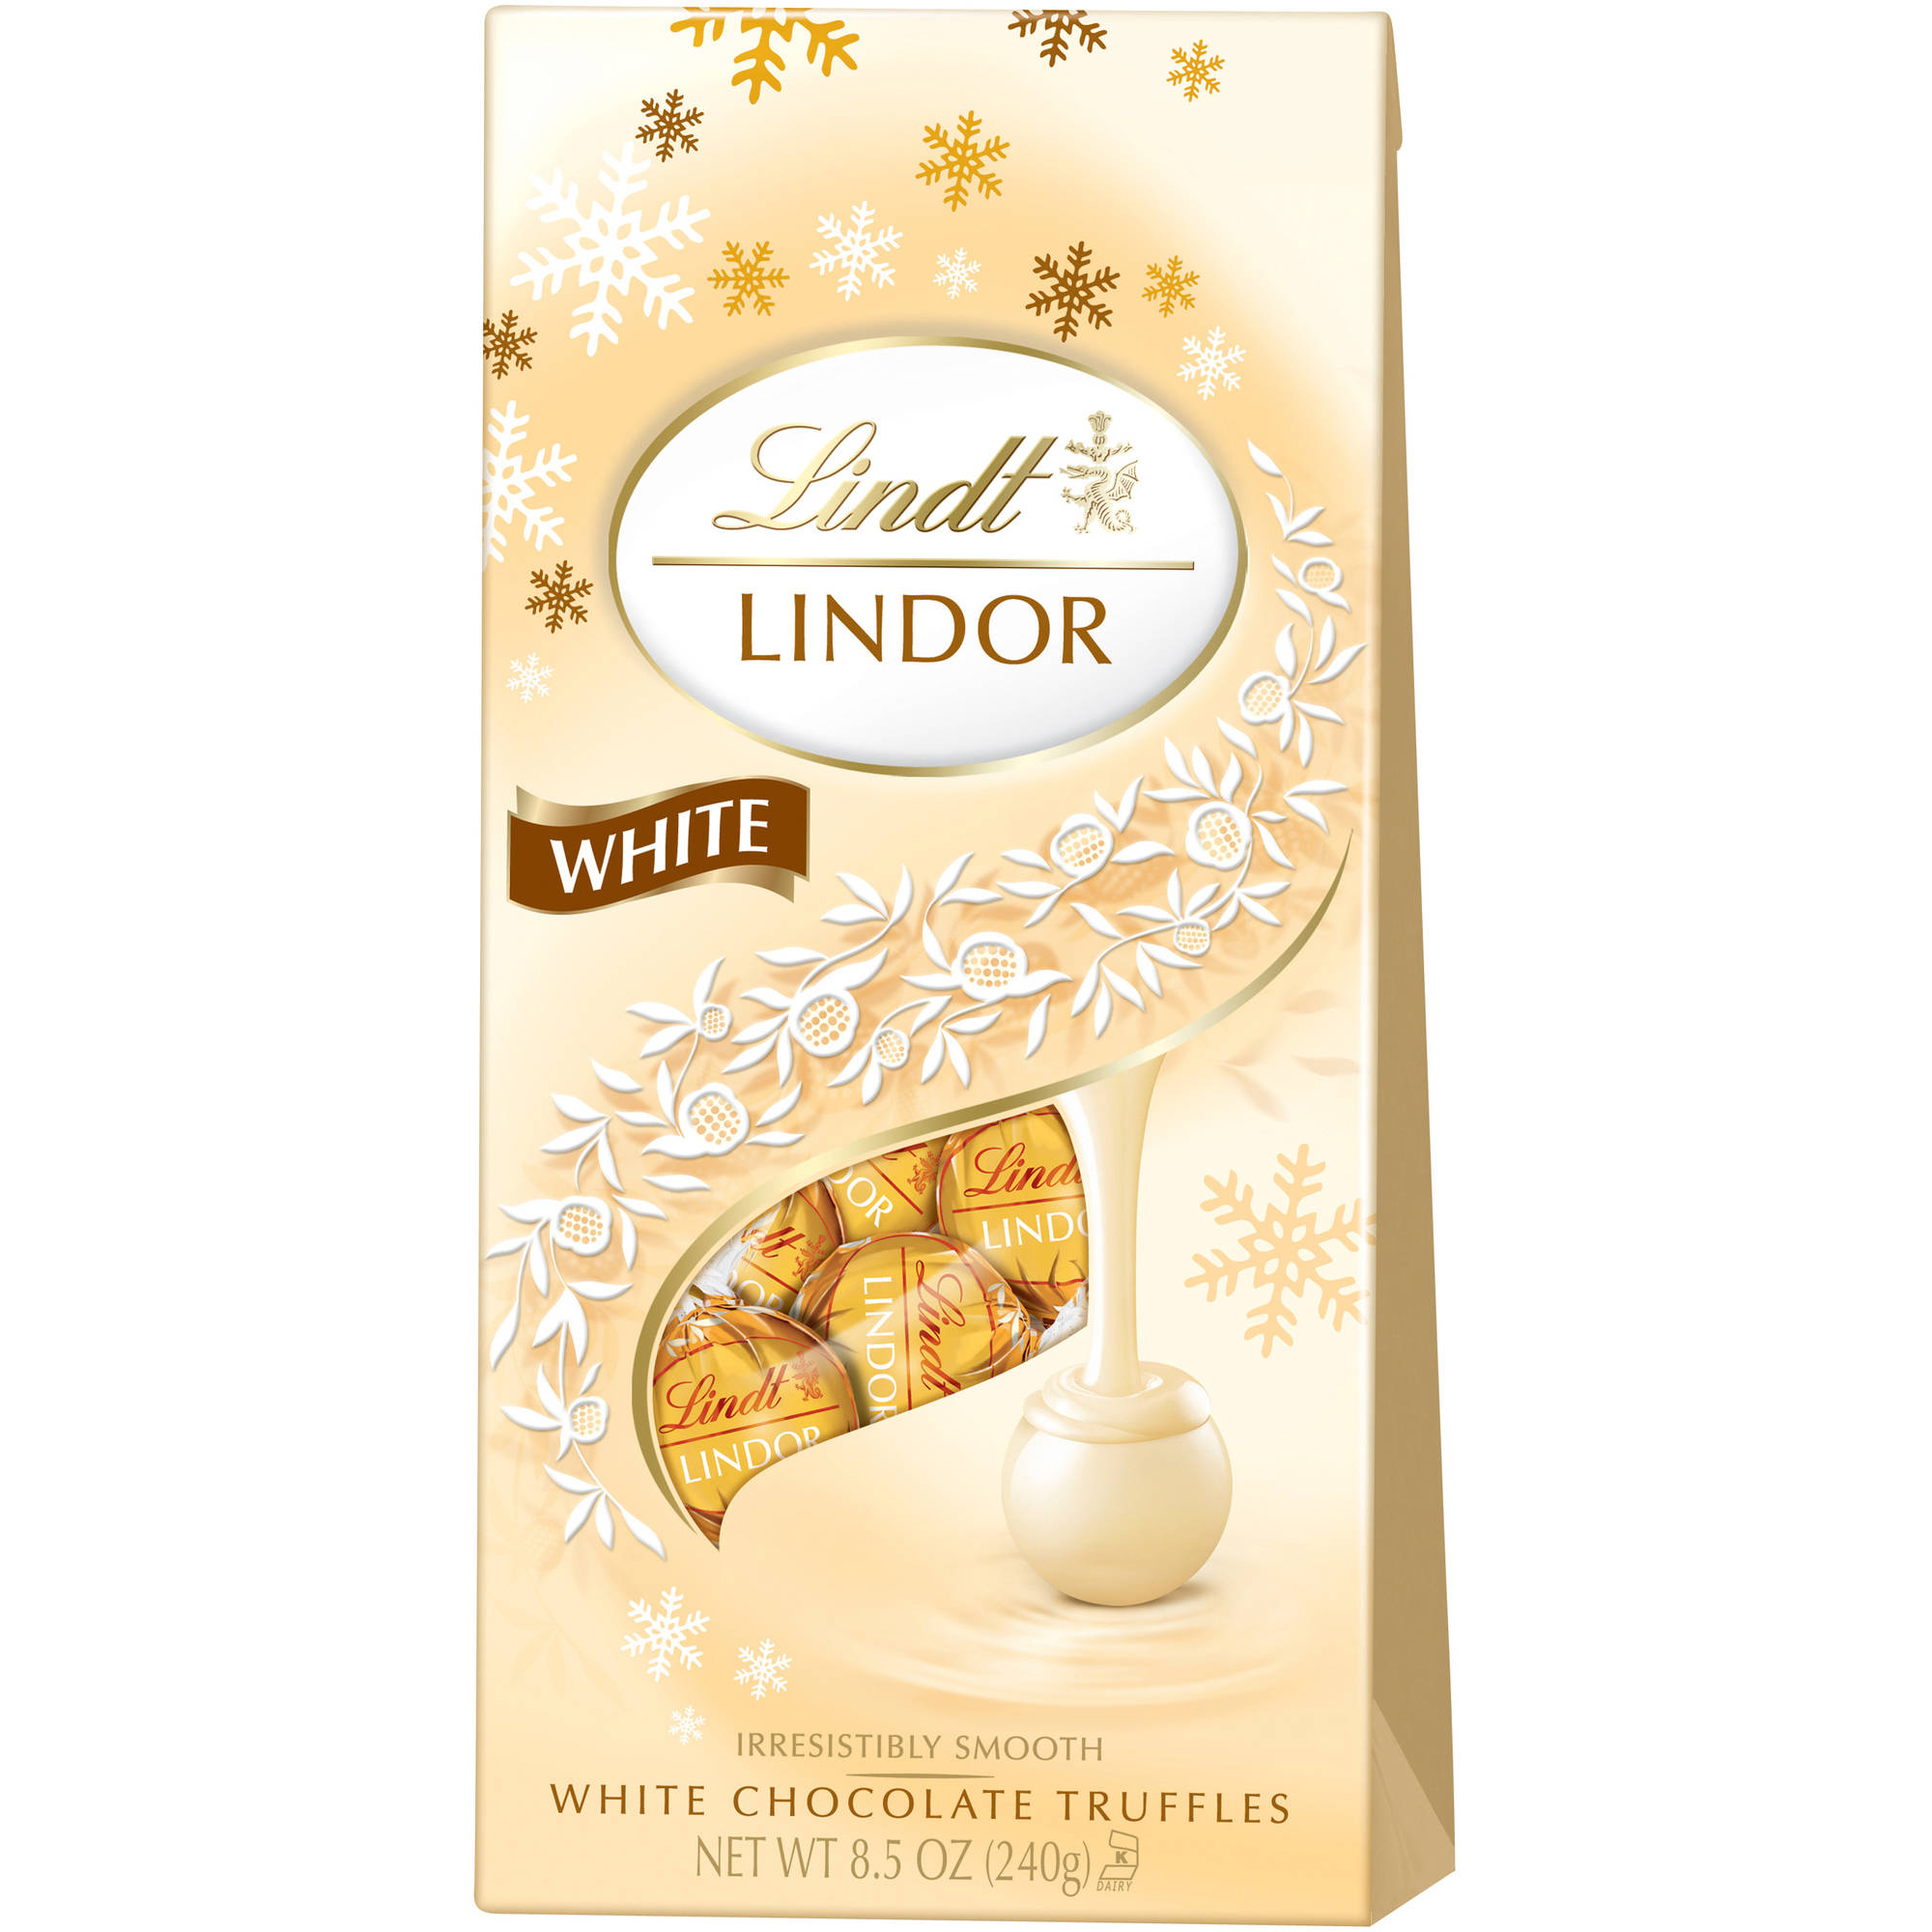 Lindt Lindor White Chocolate Truffles Holiday Gift, 8.5 oz